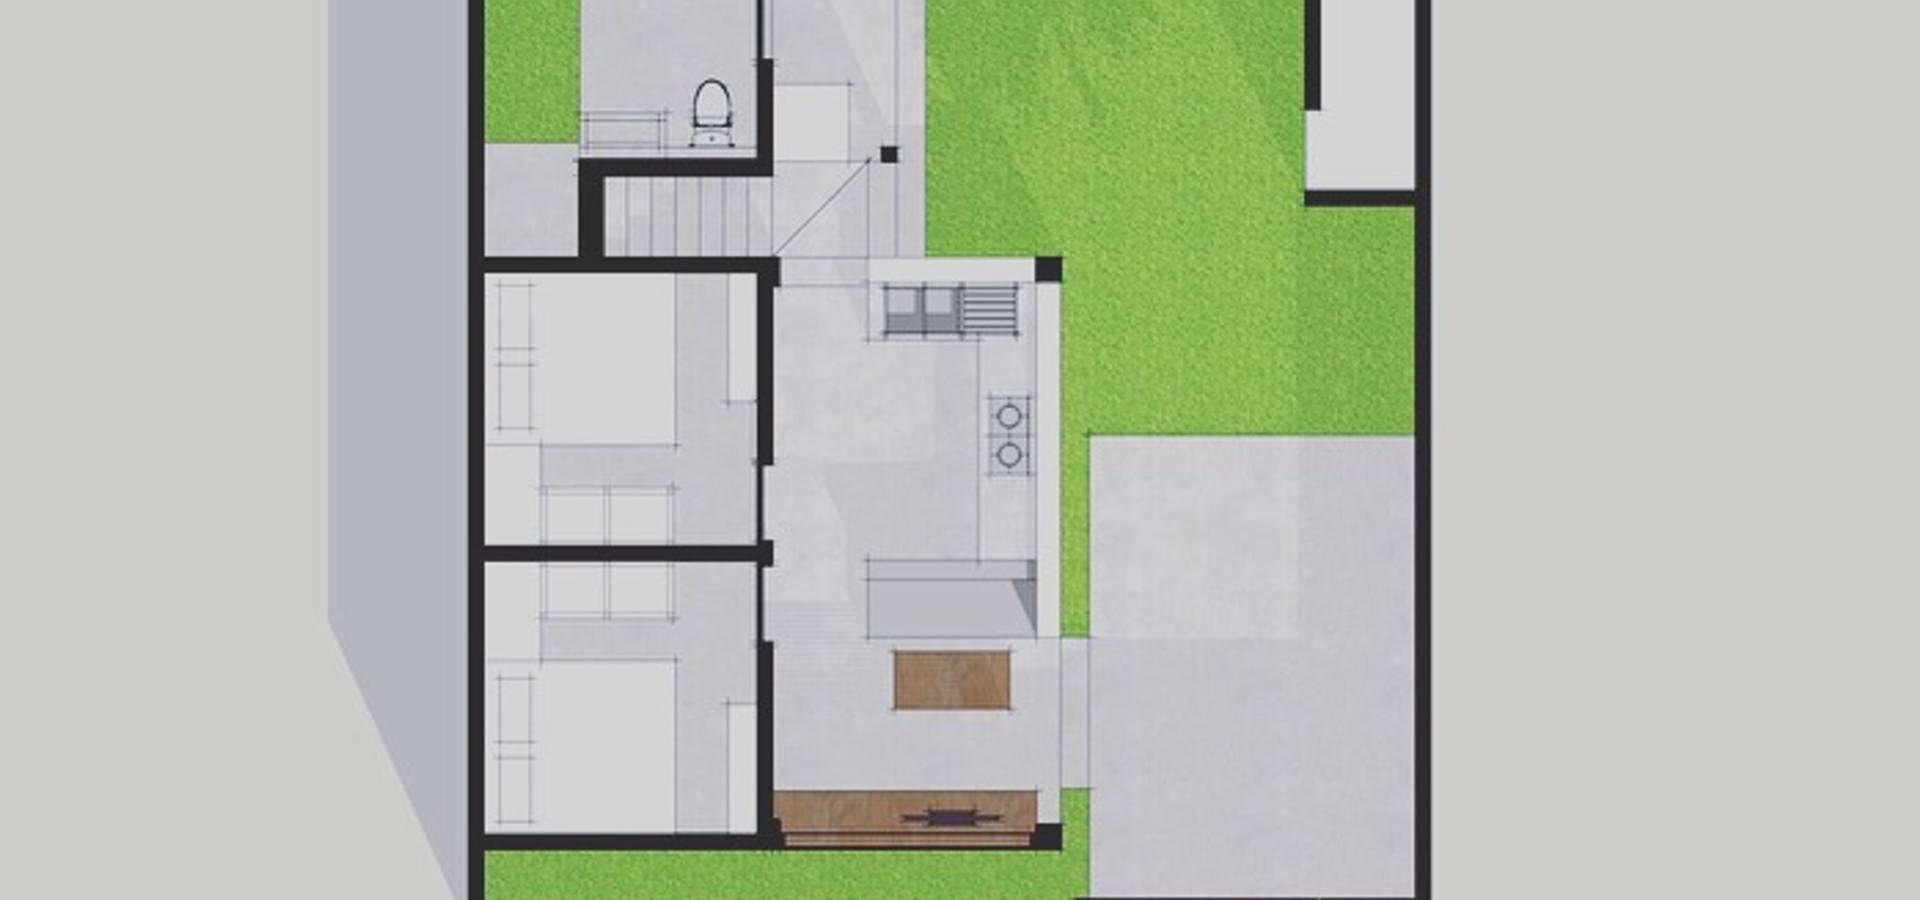 Small House Concept Design In Dalung Badung Bali Von Companion